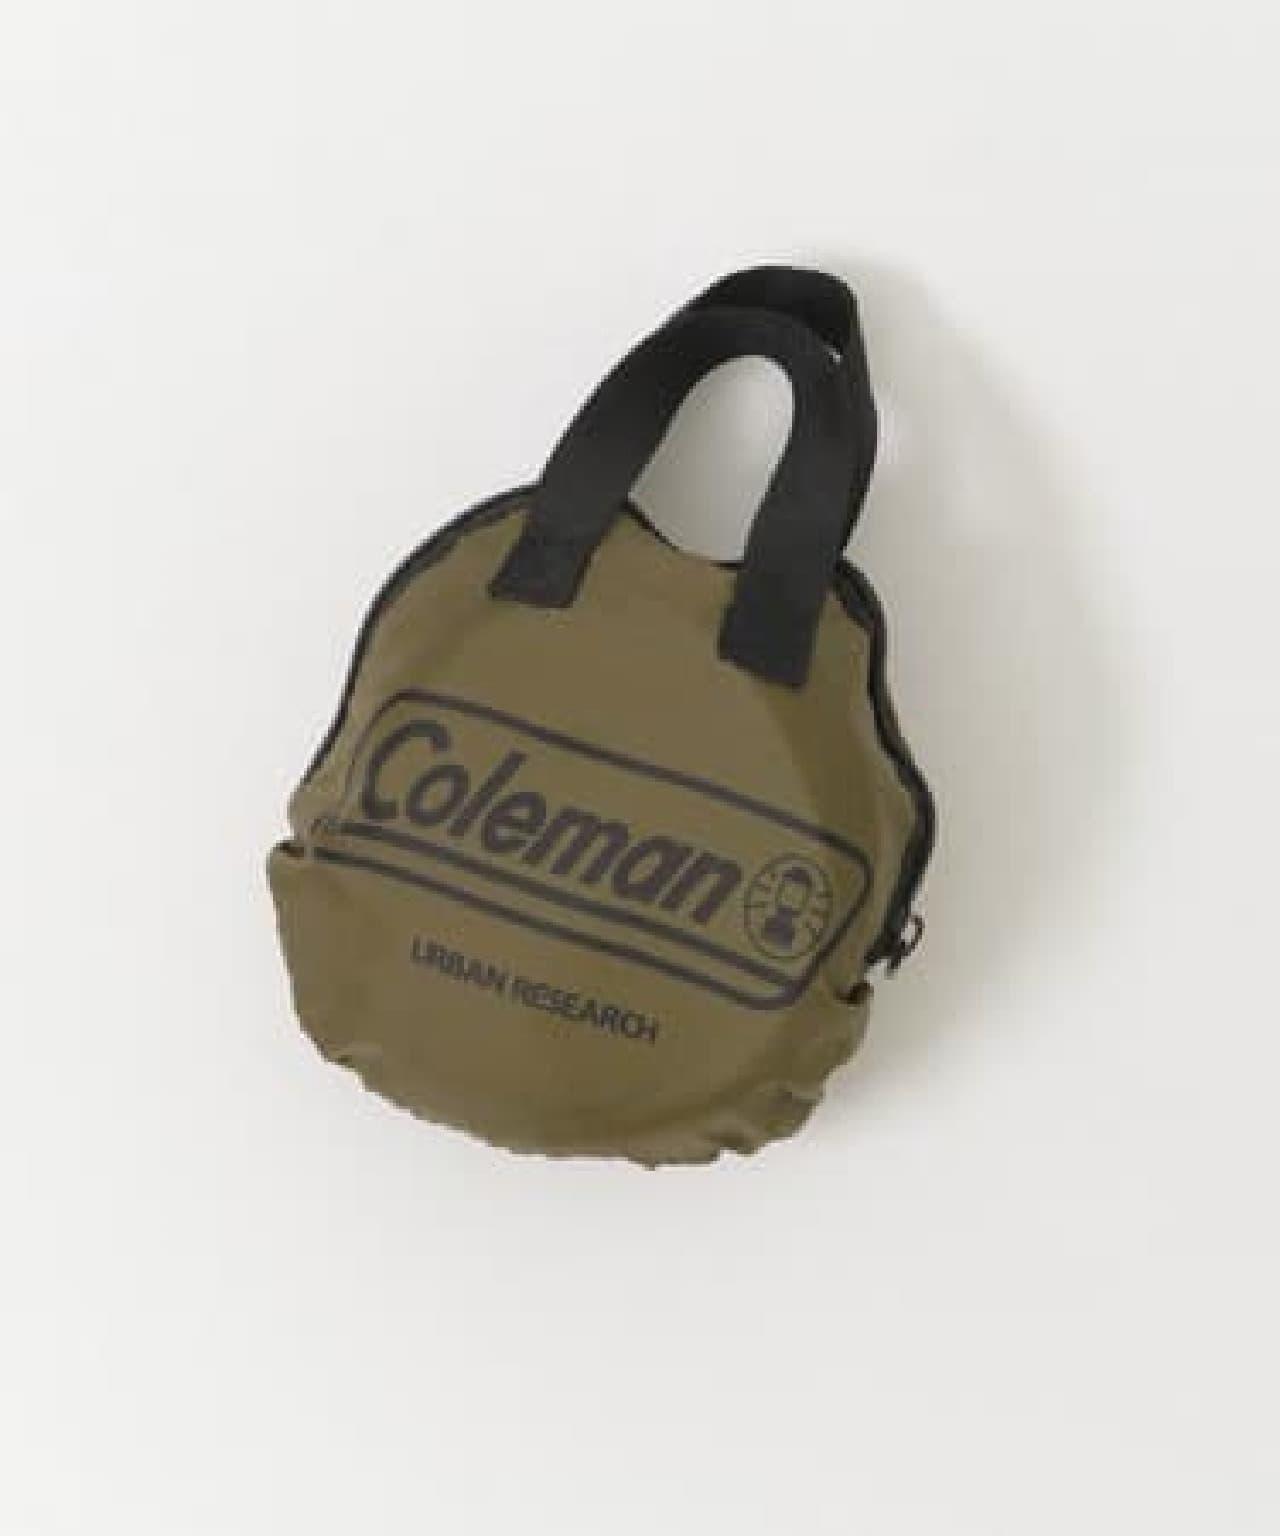 Coleman×URBAN RESEARCHコラボ新作 -- キャンプで役立つチェア・ ミニテーブルなど